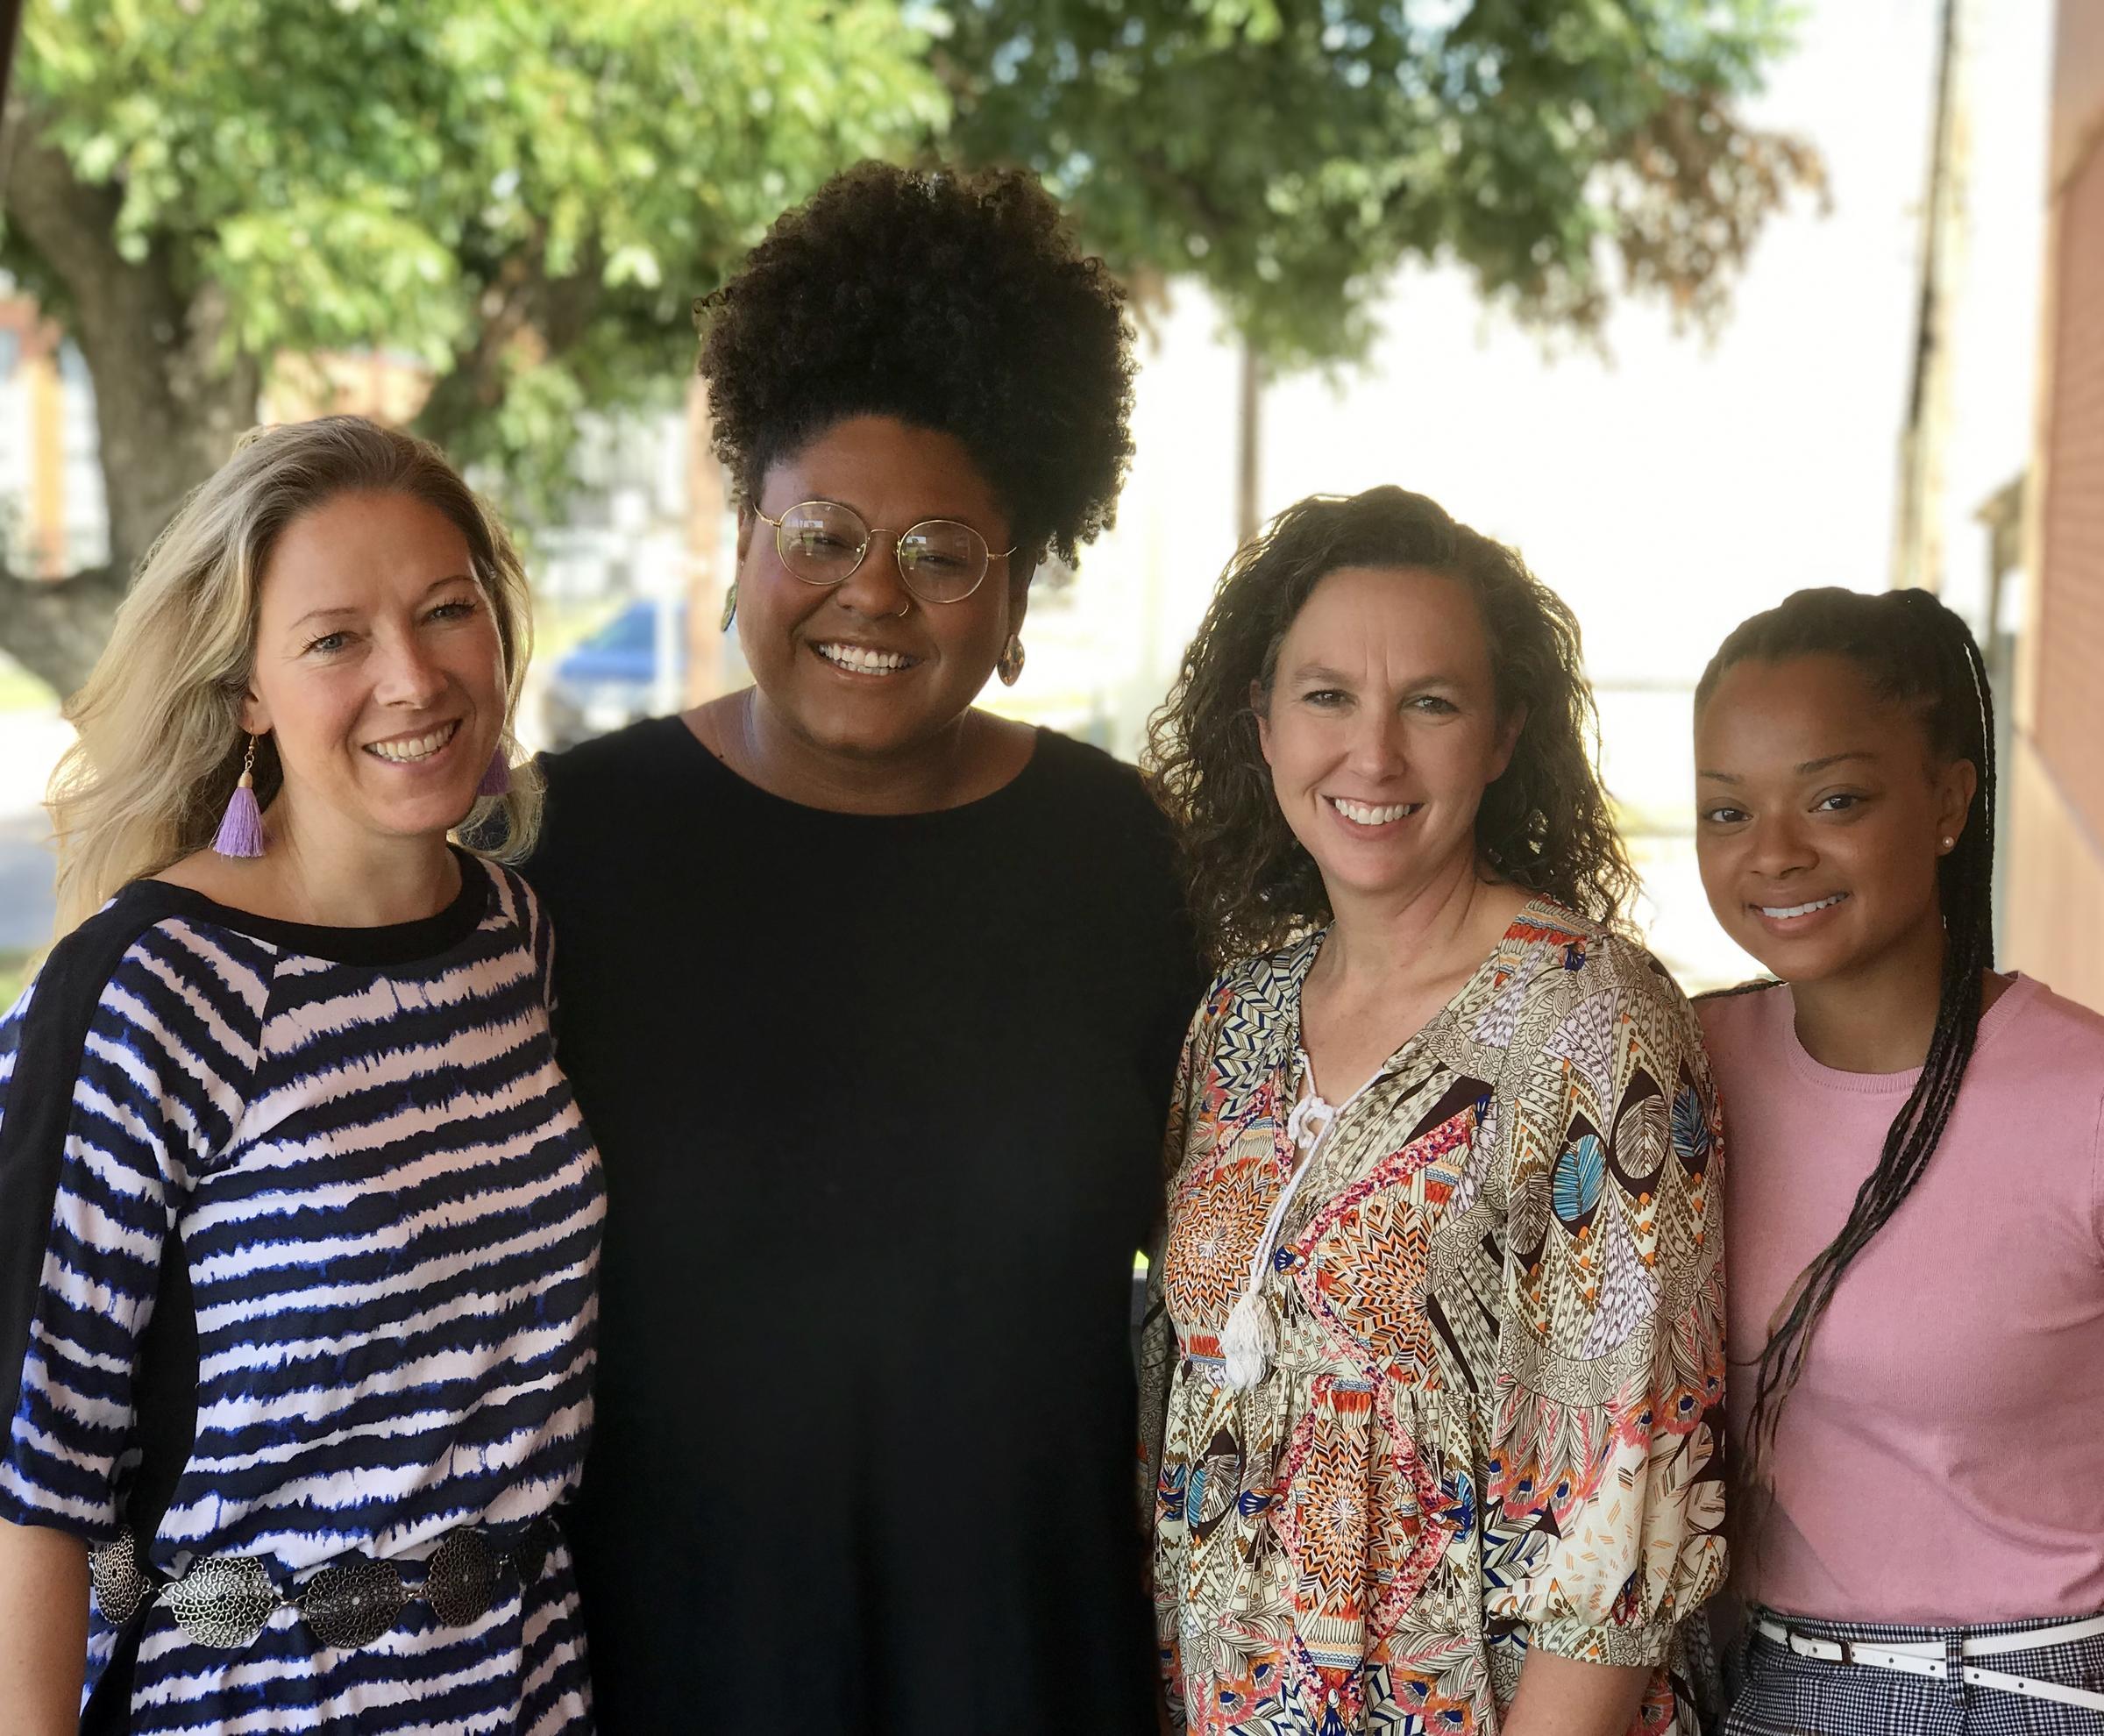 Fiona Bond, Rae Jefferson, Angela Everett and Kennedy Sam at the KWBU Studios.  (BRODIE BASHAW/ KWBU RADIO)